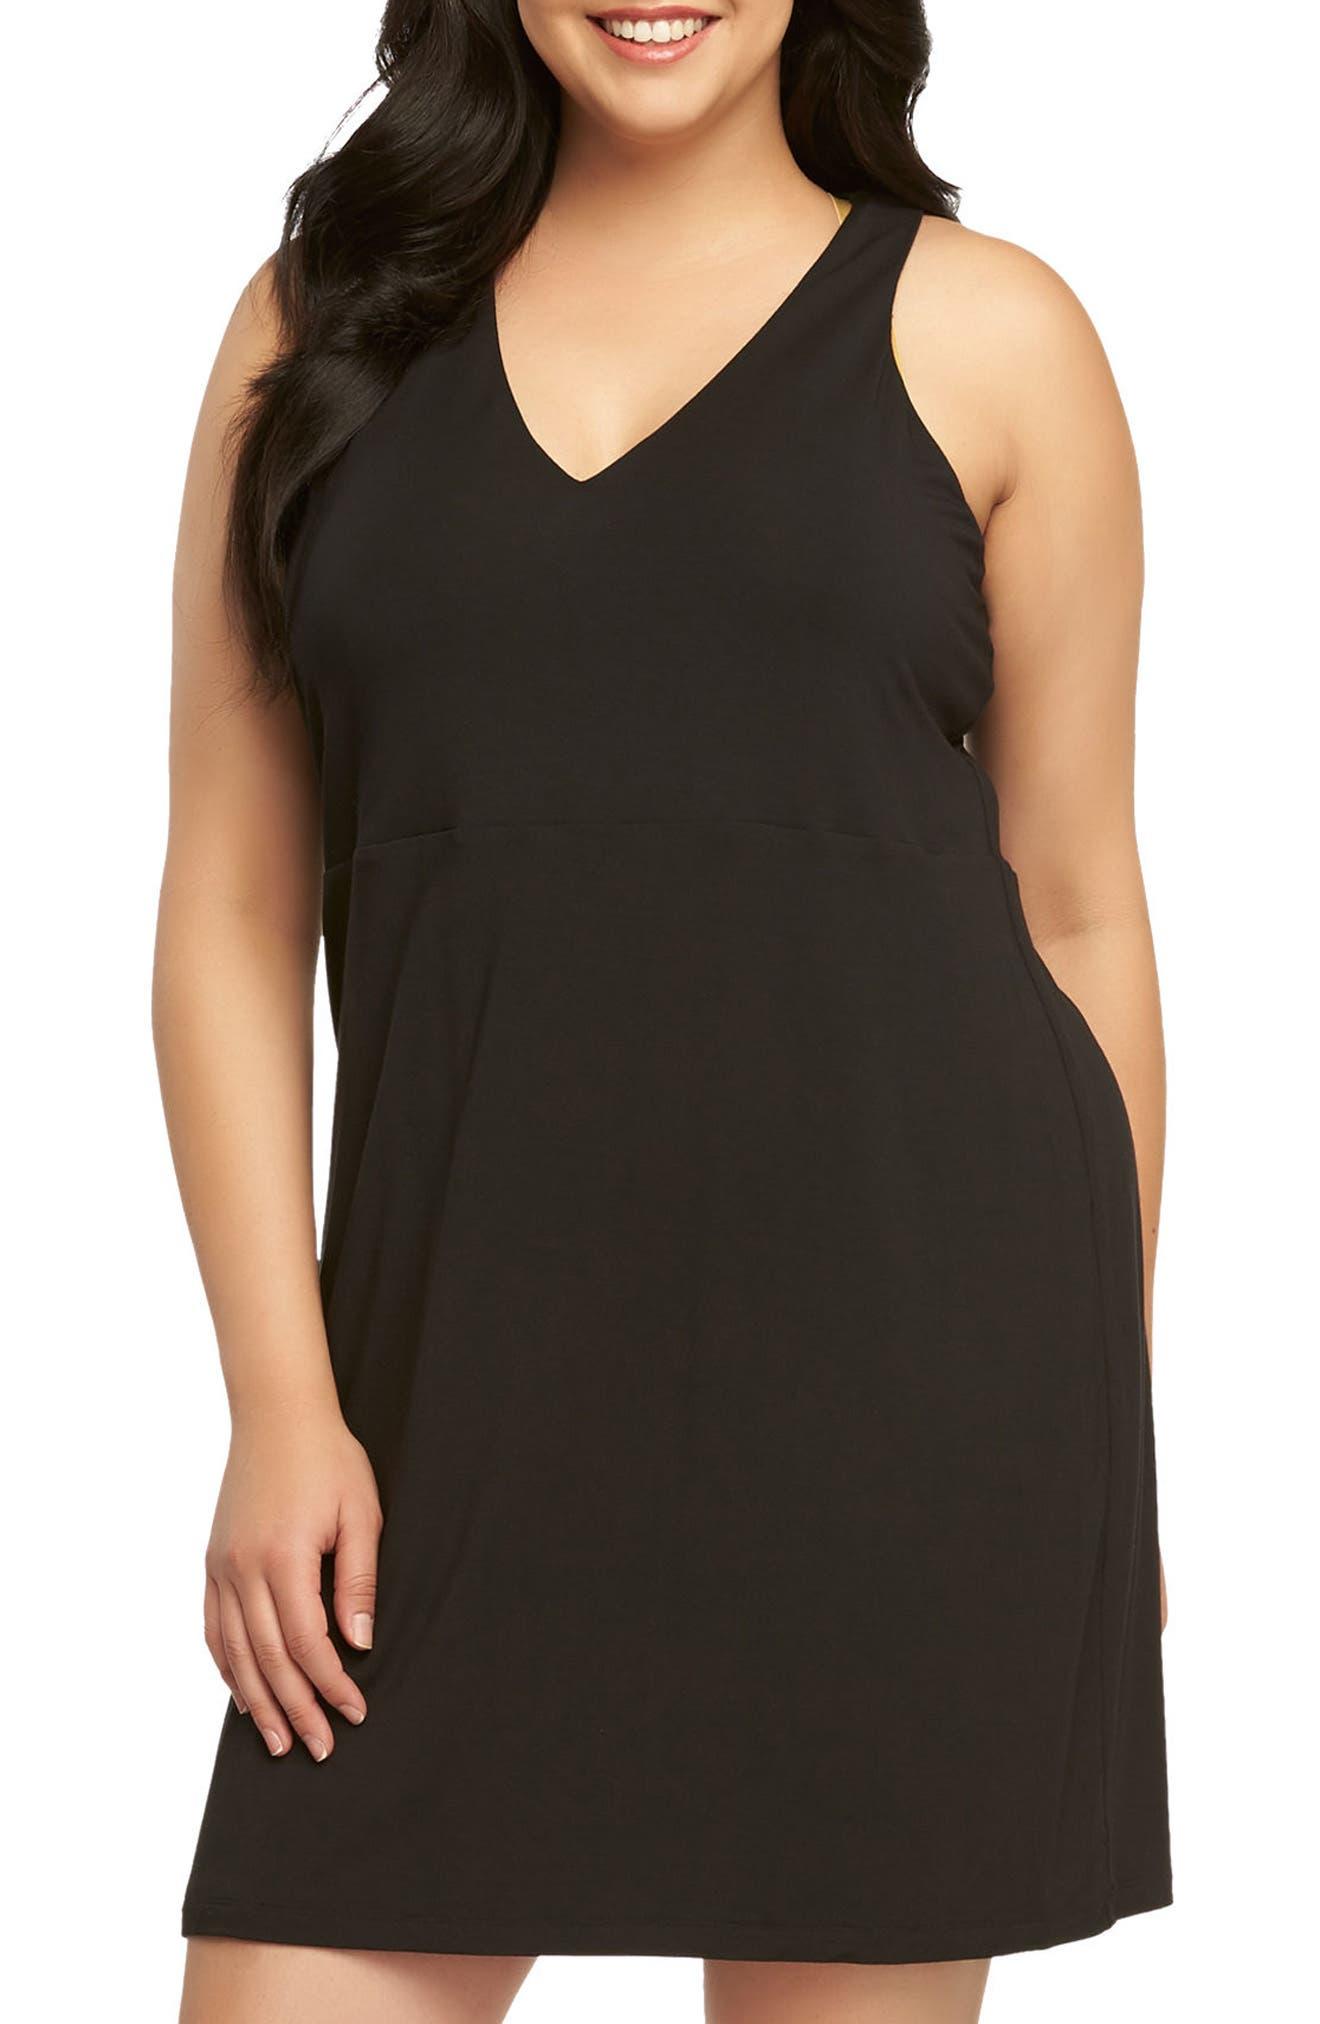 Amari Back Cutout Shift Dress,                         Main,                         color, Black